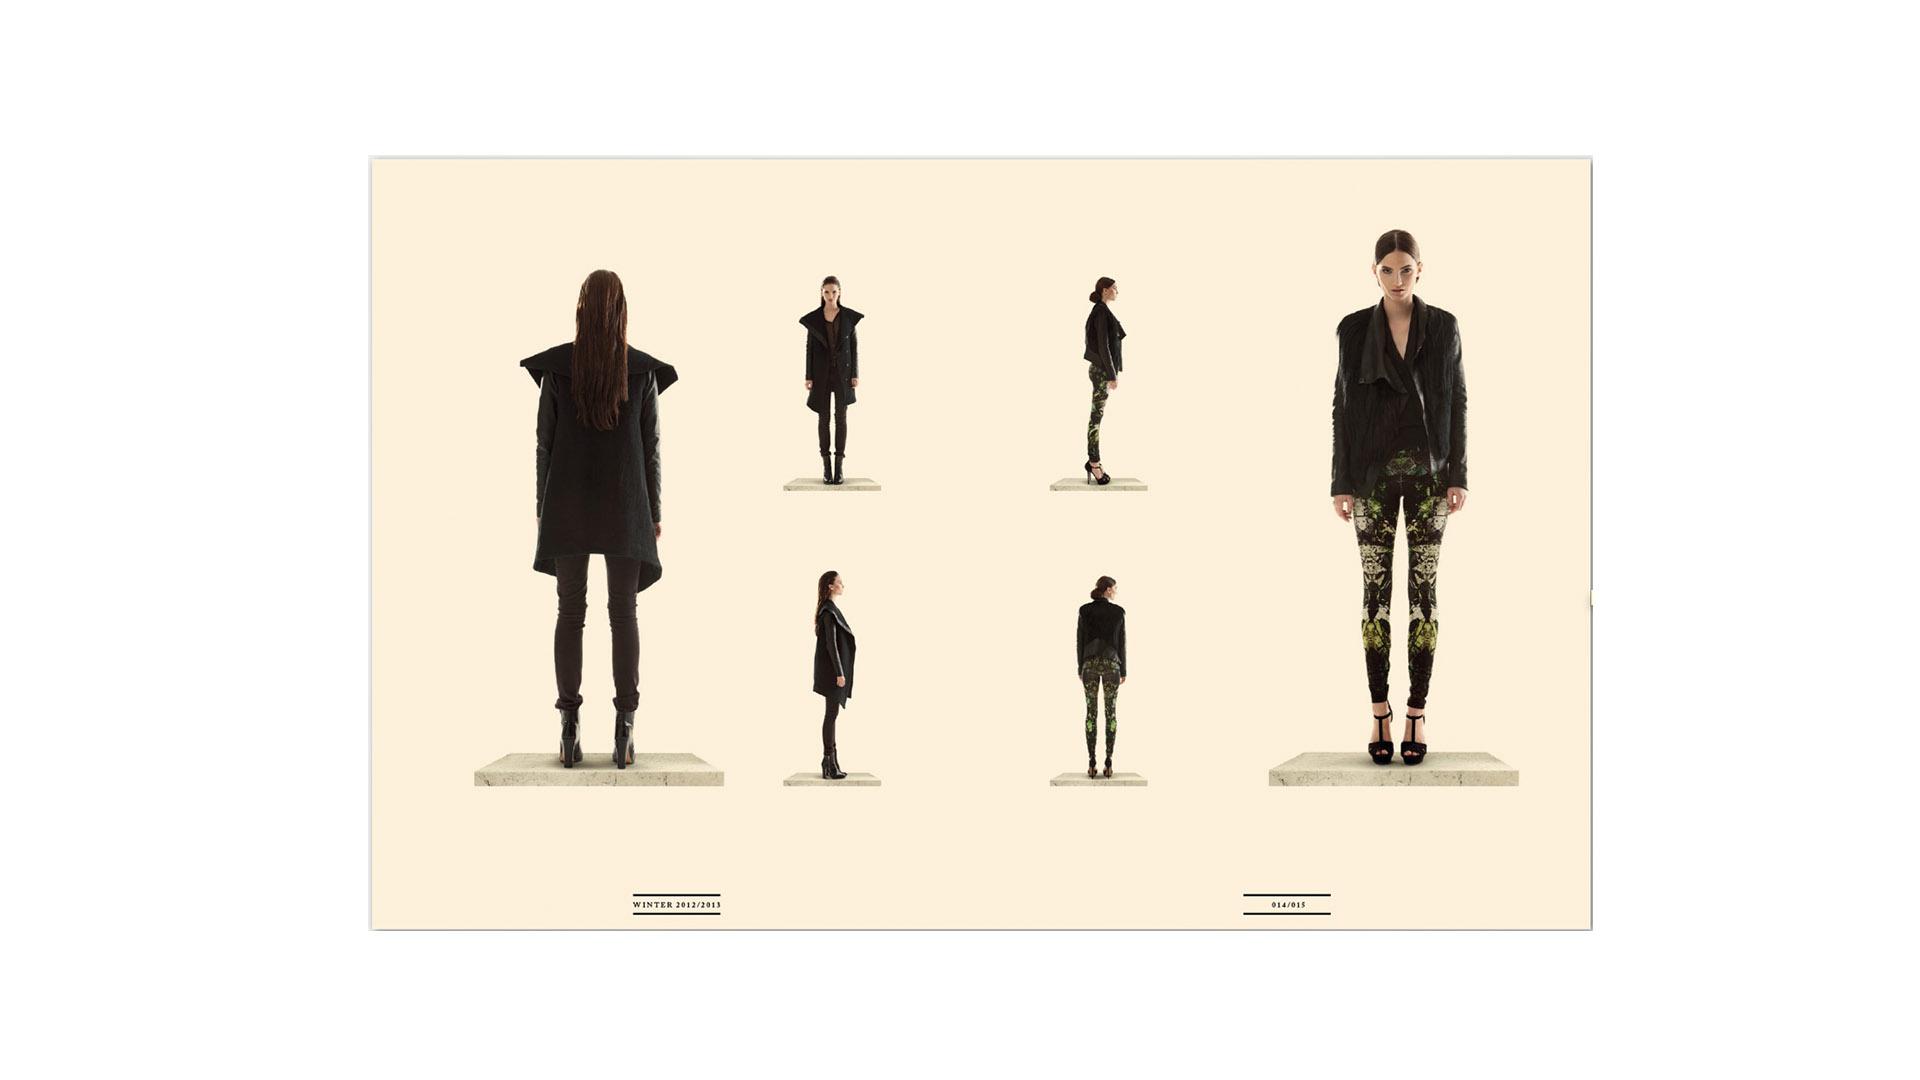 030216_16_9_Fashion_sheets_0012_Ebenenkomposition 13